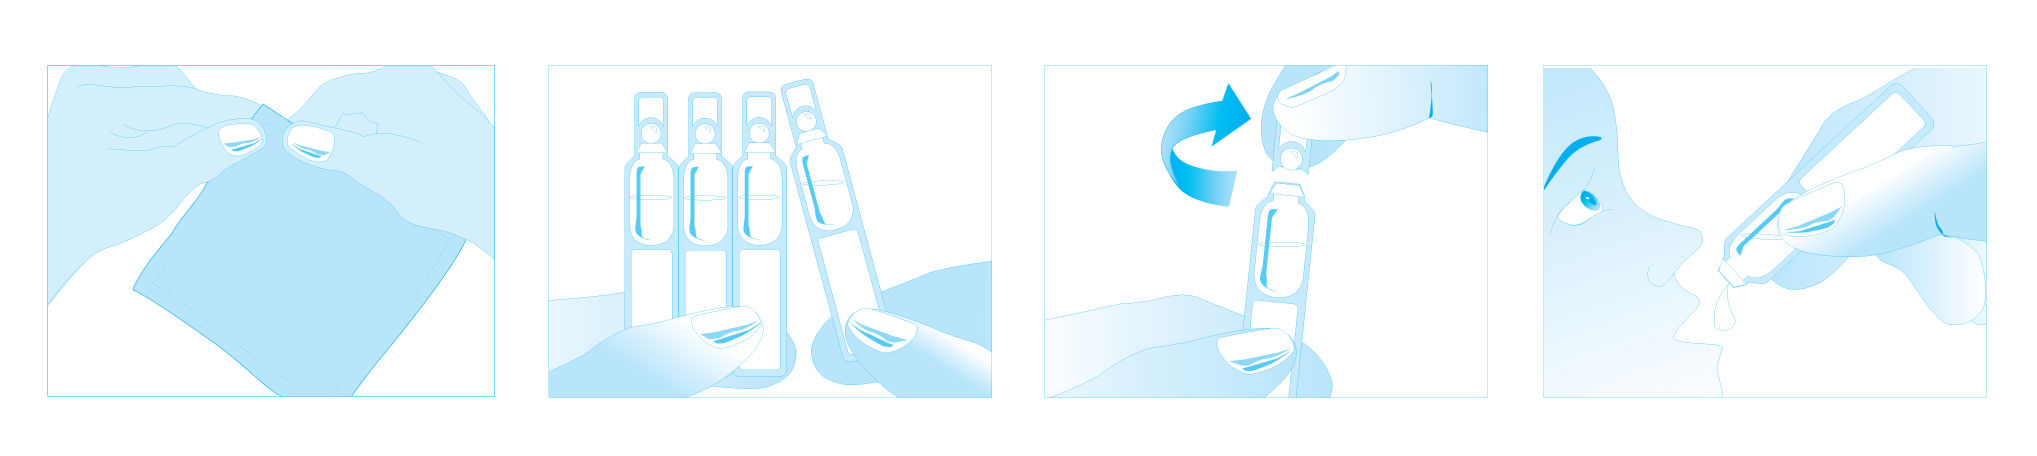 boiron-coryzalia-cold-1-month-to-6-years-30-x-1ml-2.jpg